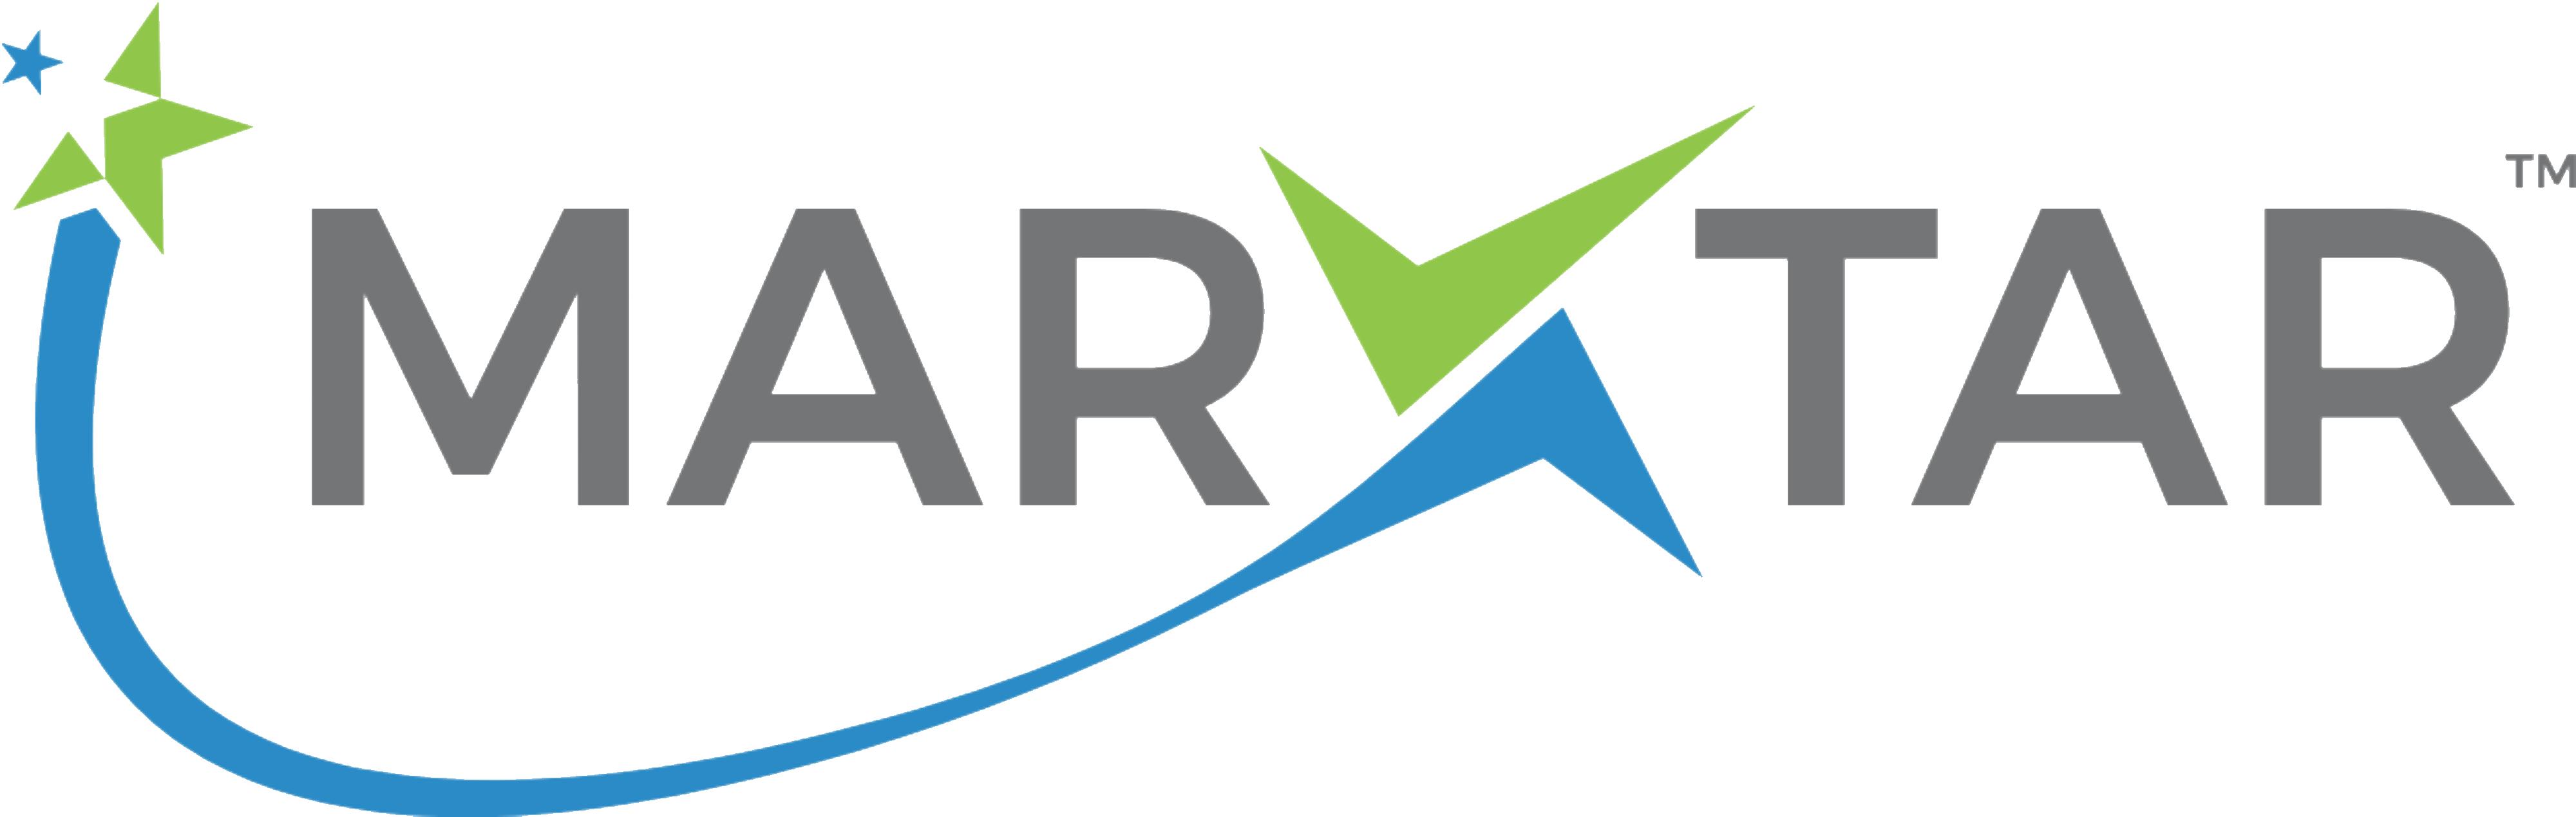 MarXtar